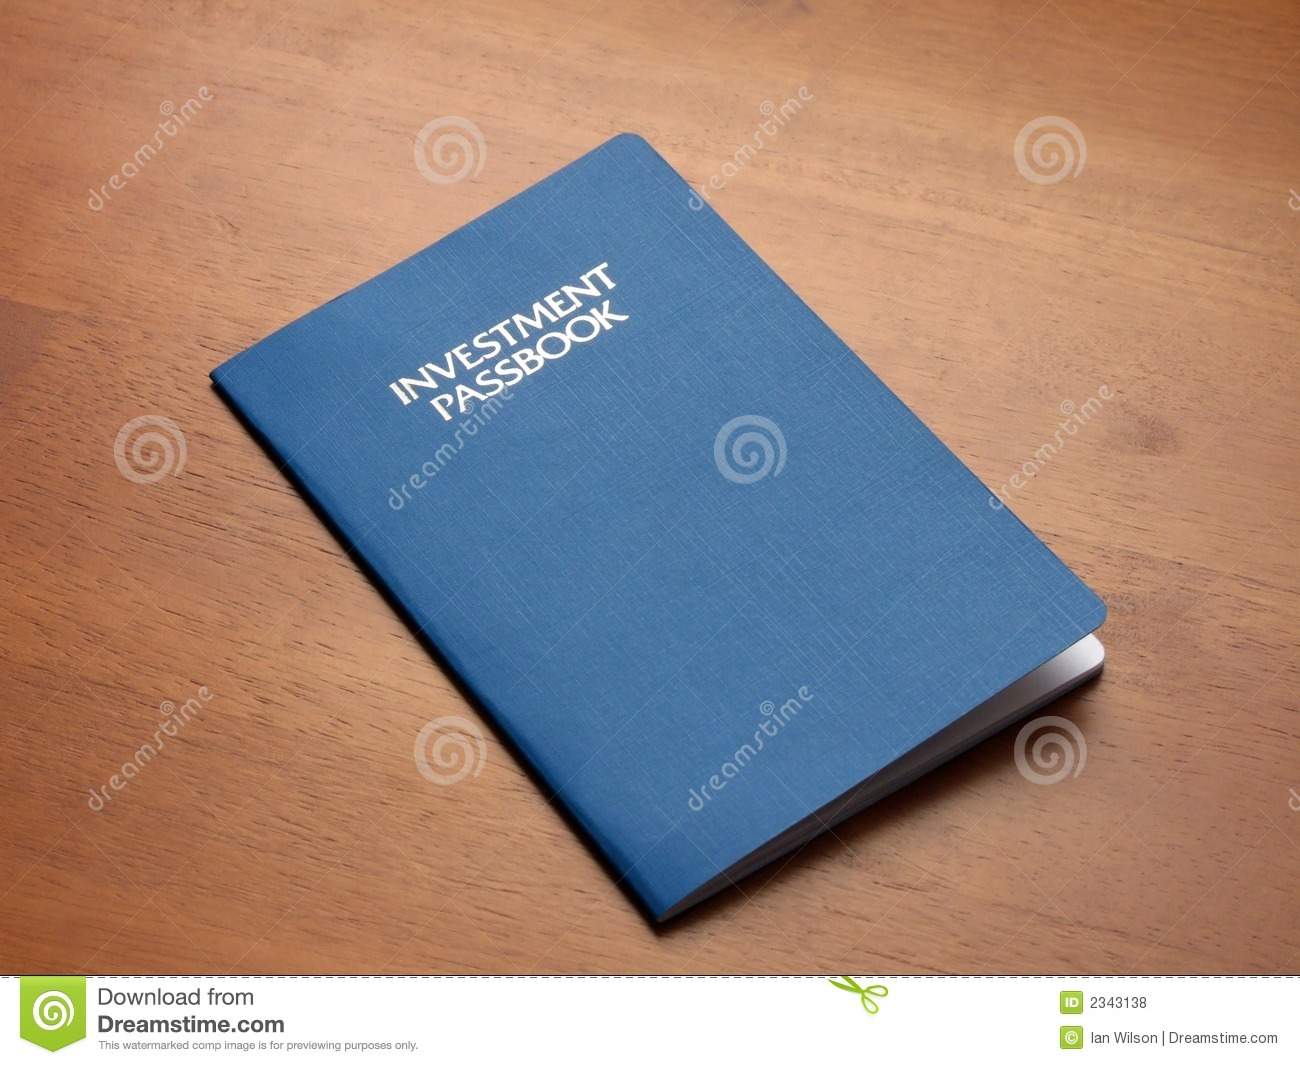 investment-account-passbook-2343138